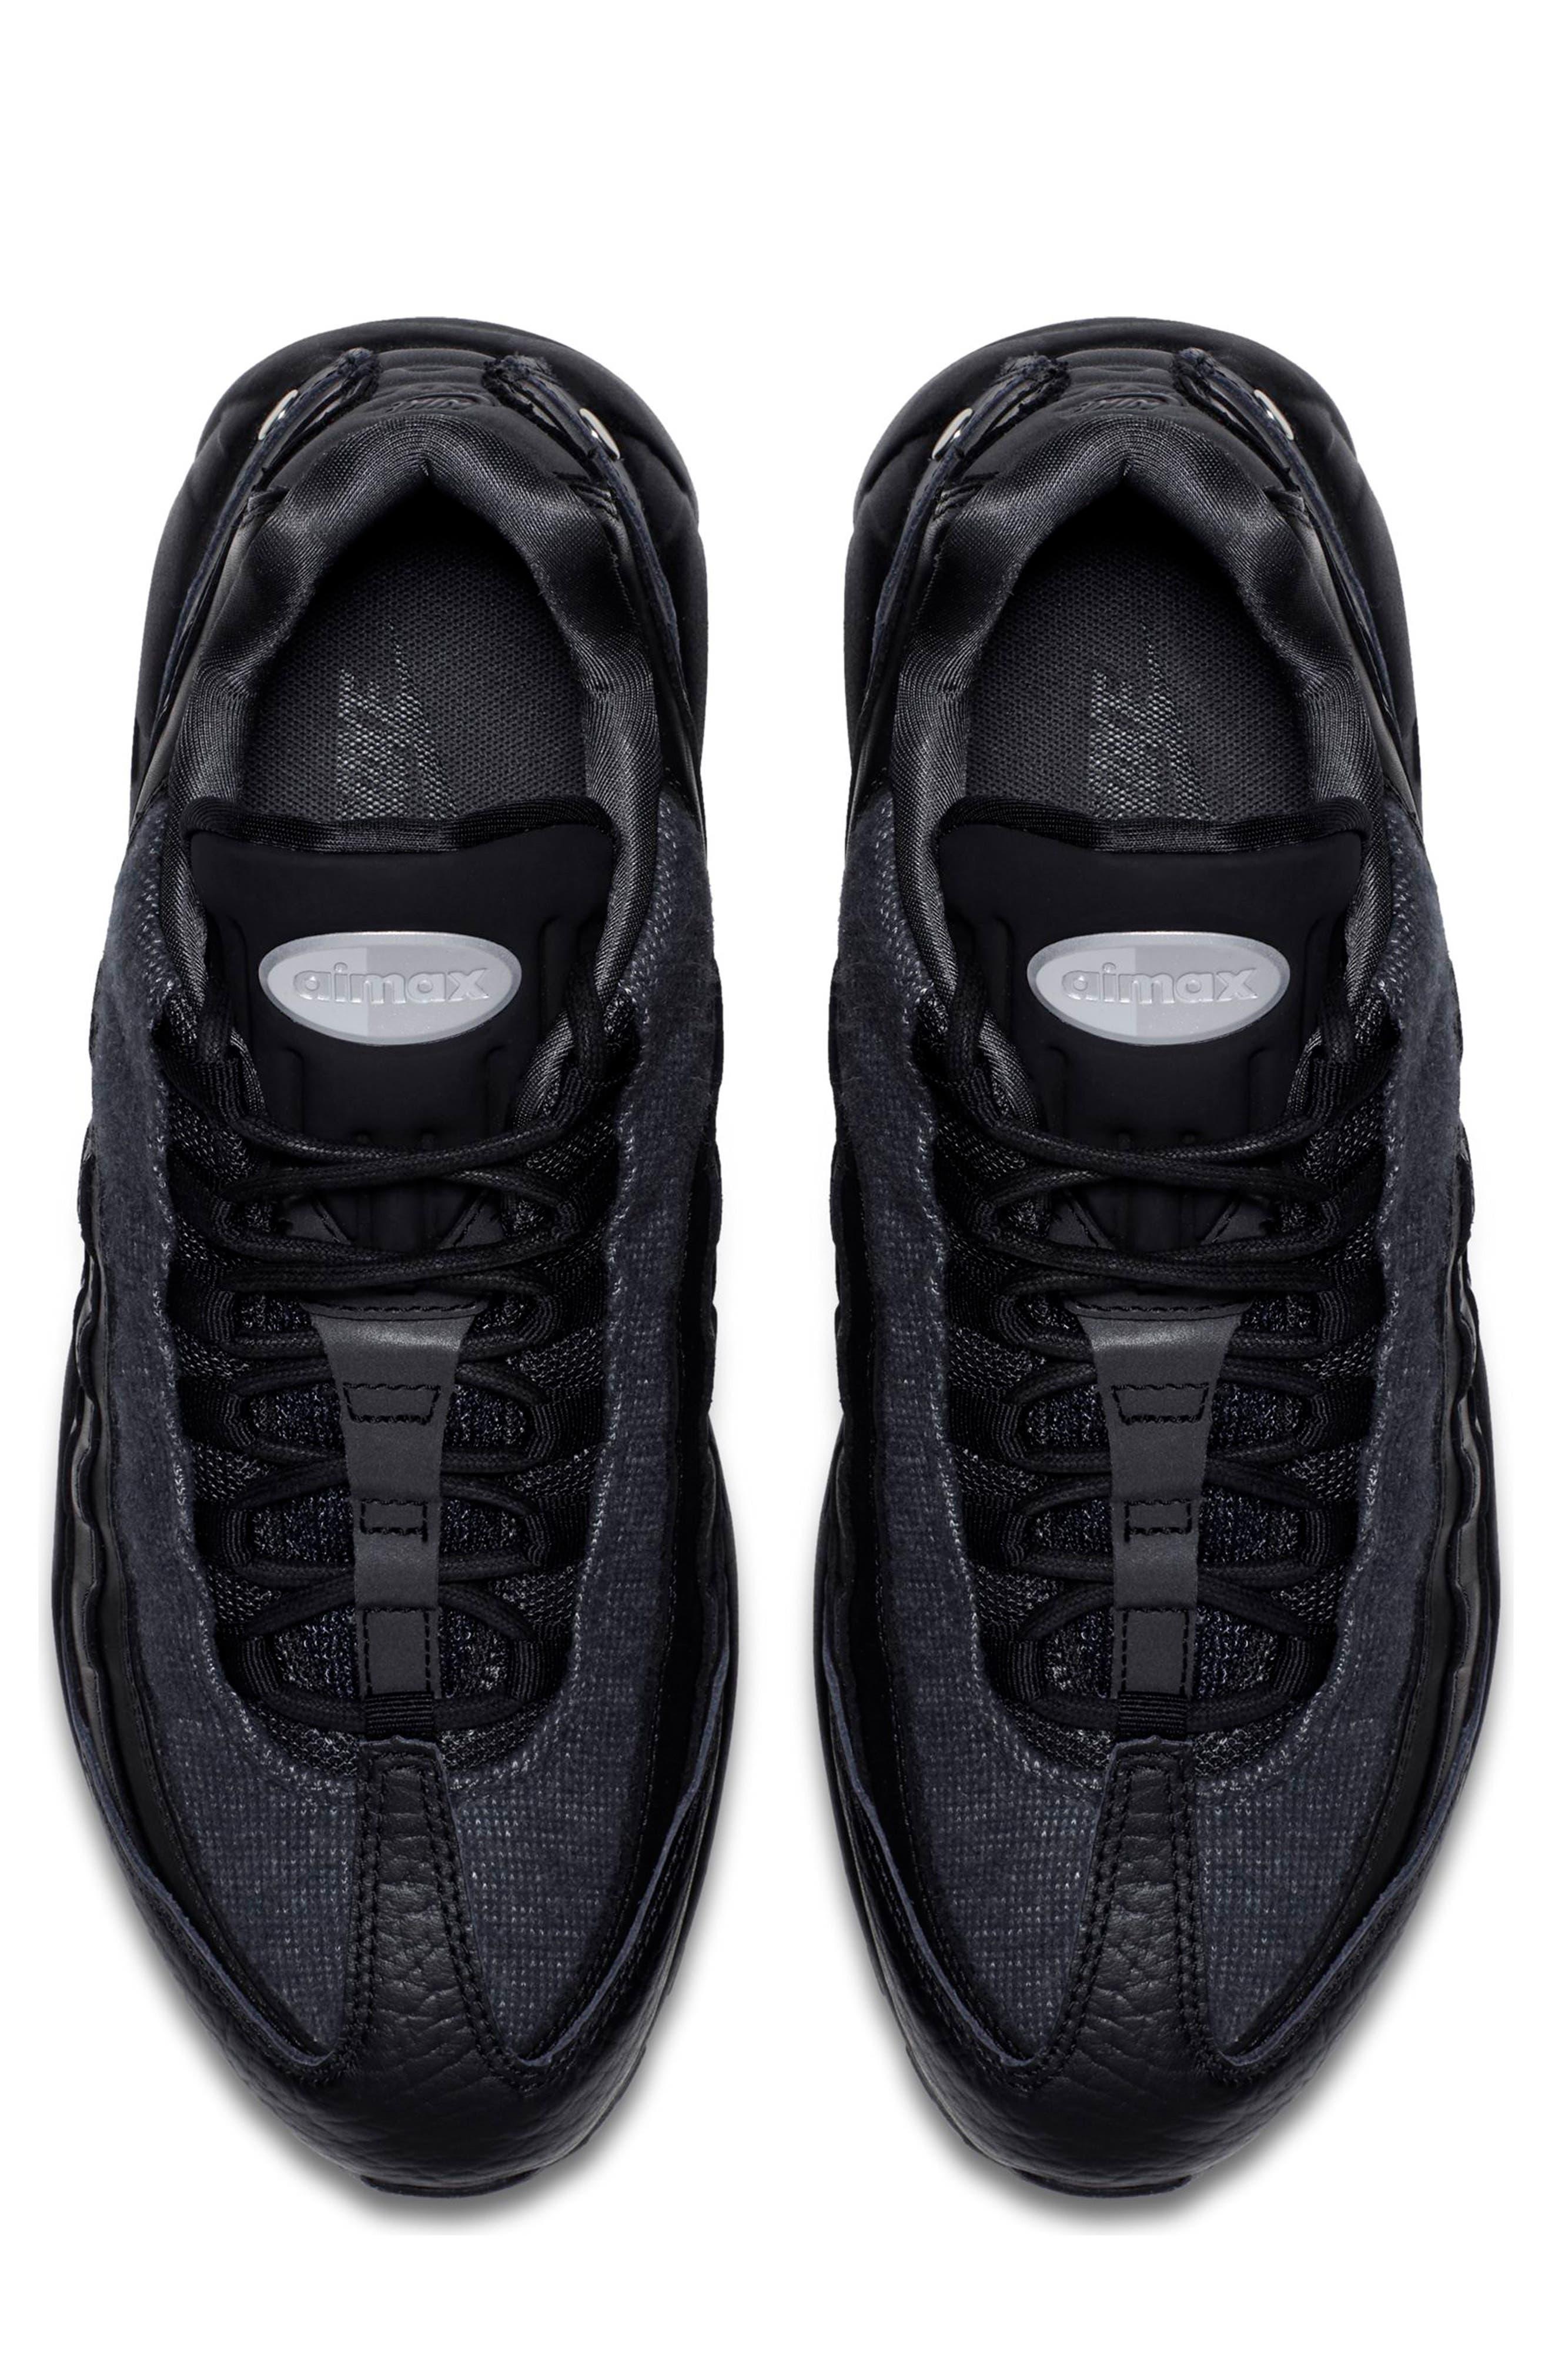 Air Max 95 NRG Sneaker,                             Alternate thumbnail 4, color,                             BLACK/ TEAM RED/ ANTHRACITE